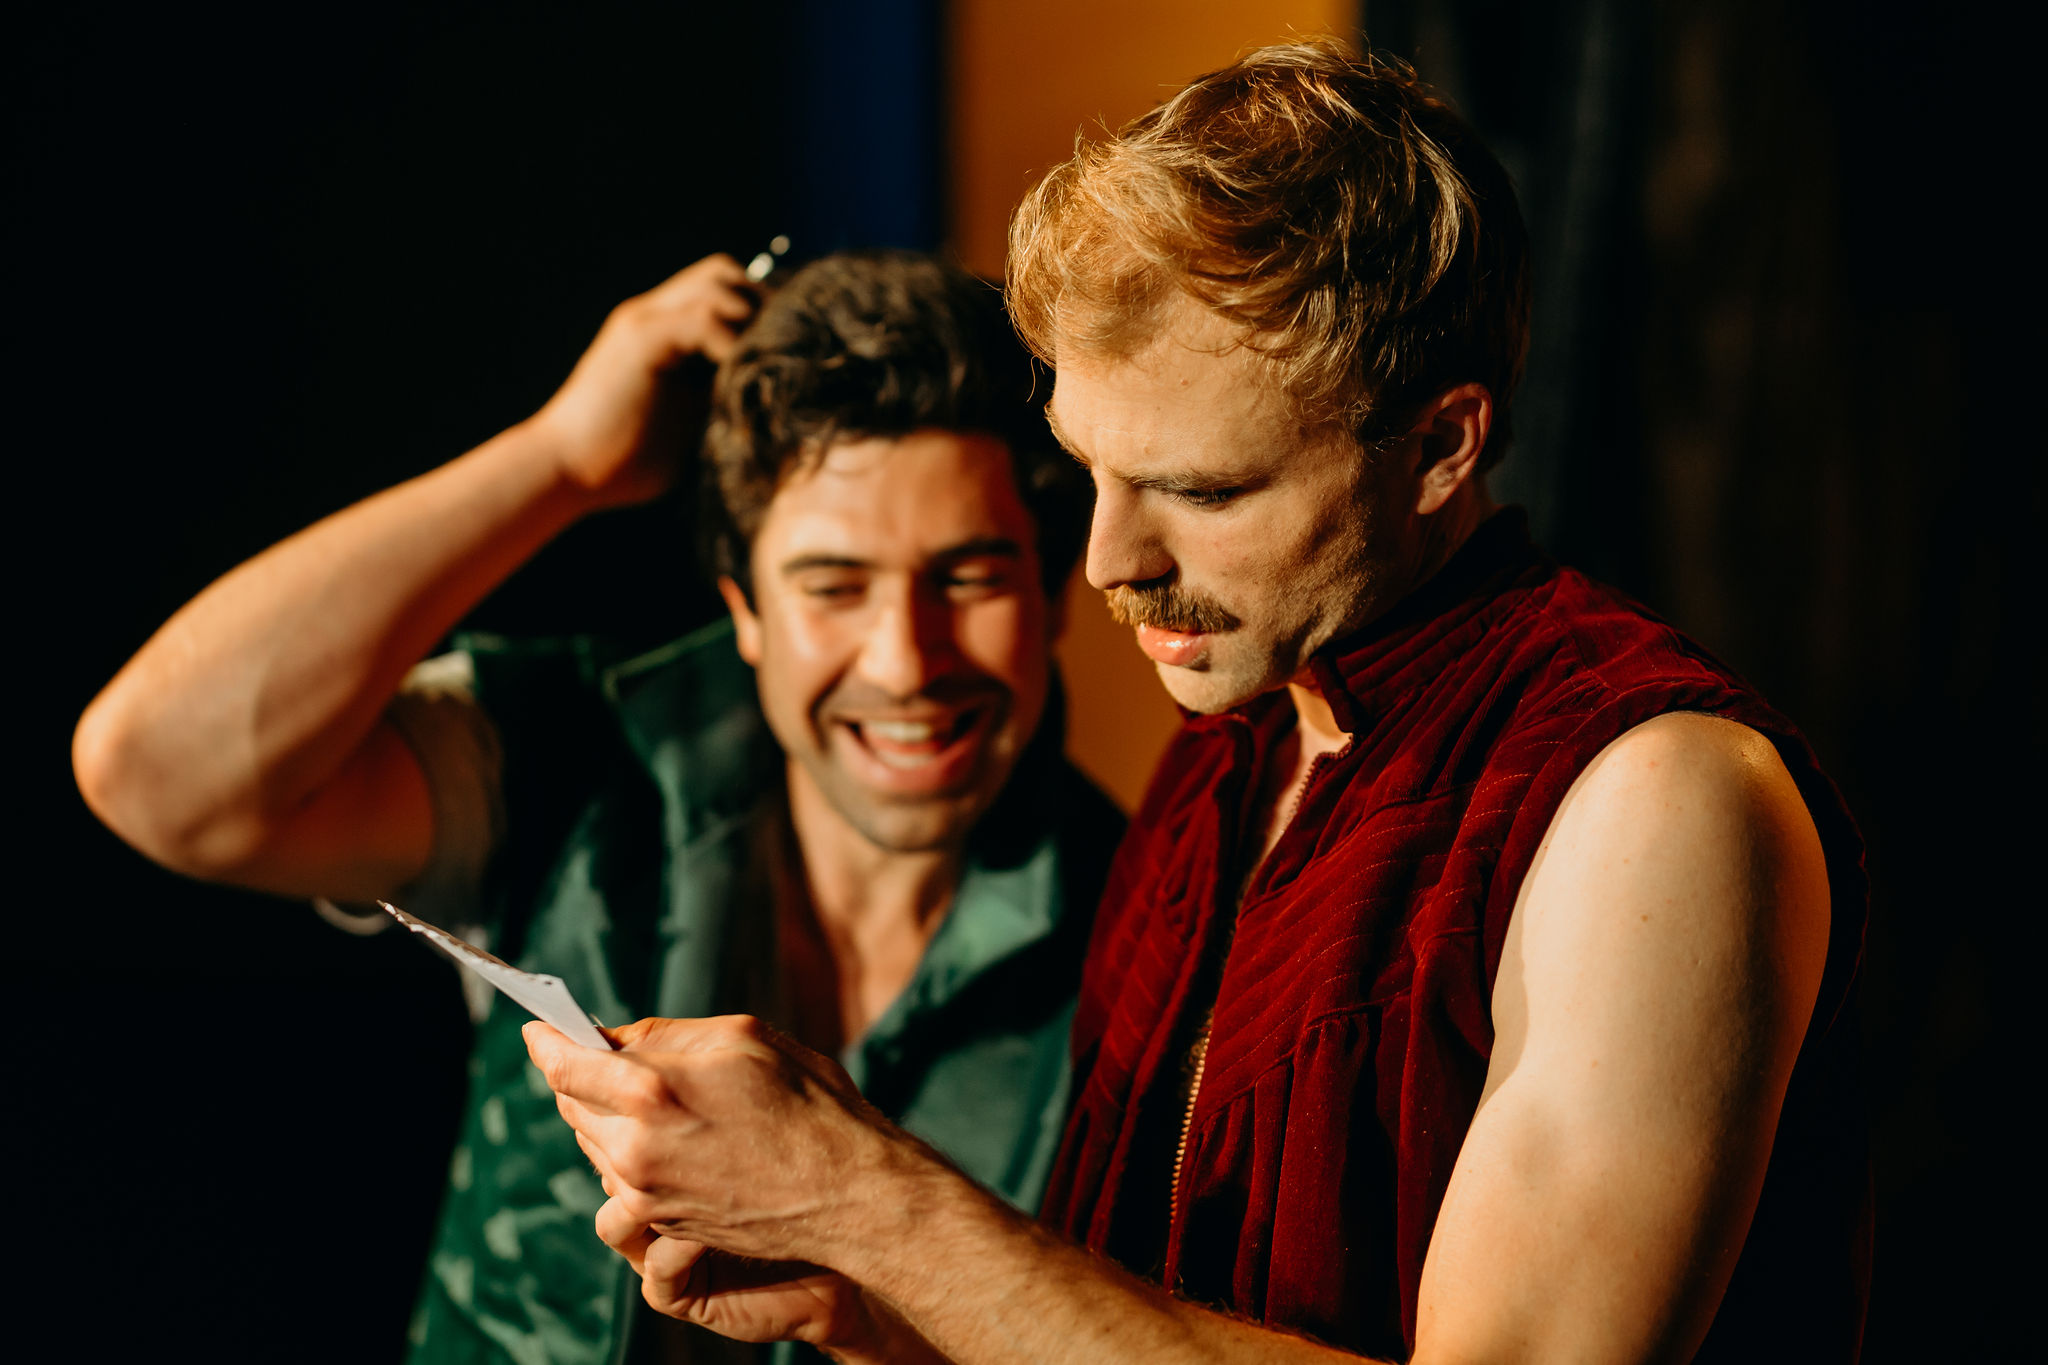 Sam Anderson as Horatio and Leigh Scully as Hamlet. Image: Jack Dixon-Gunn